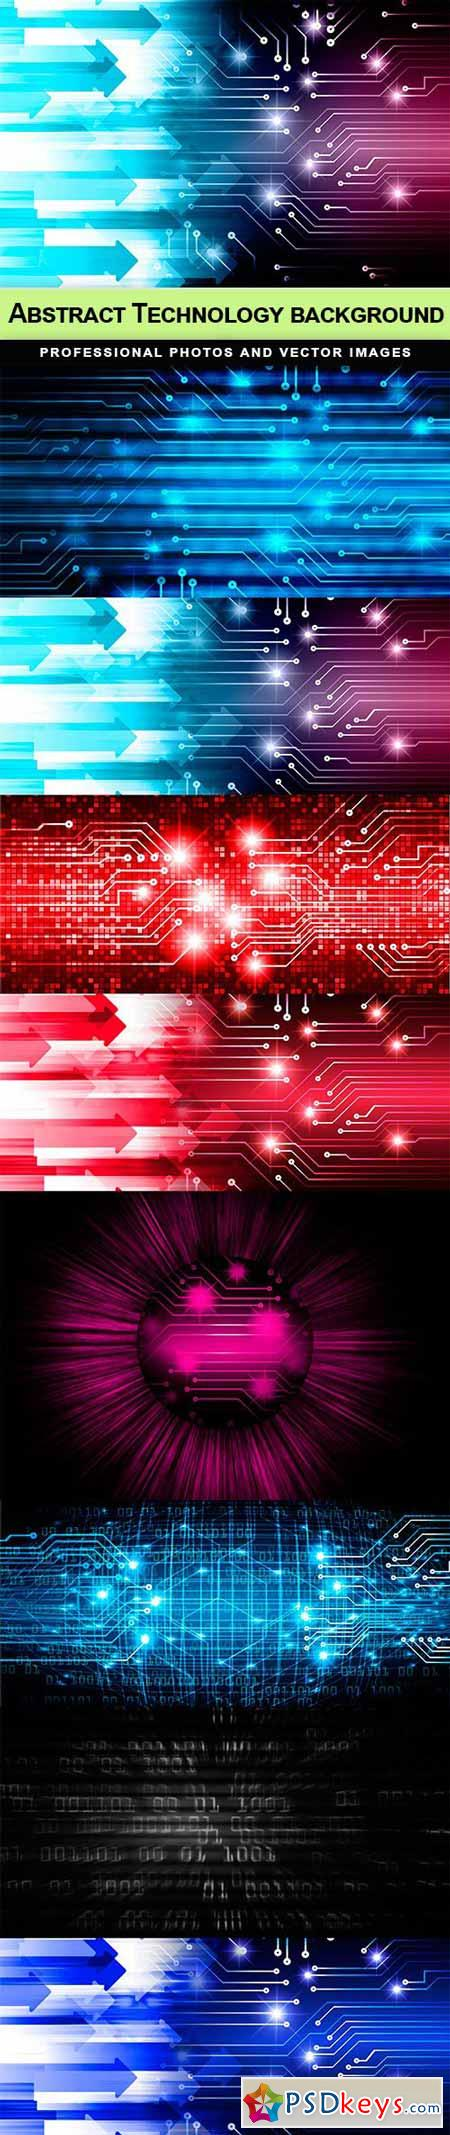 Abstract Technology background - 8 UHQ JPEG